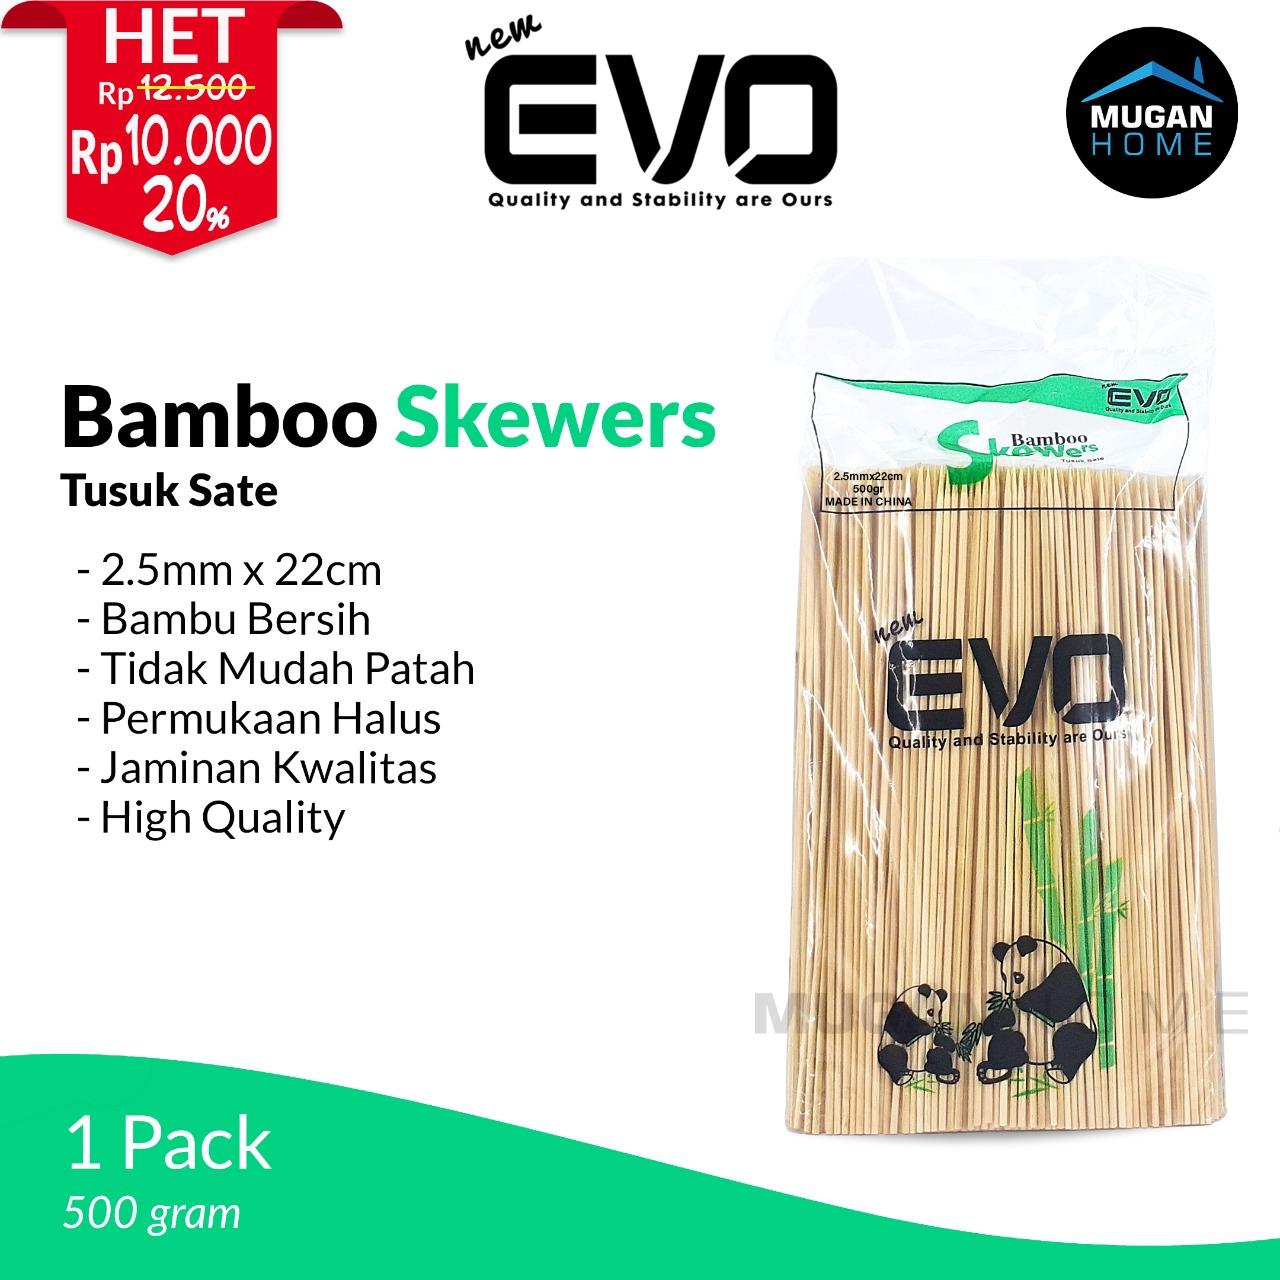 BAMBOO SKEWERS NEW EVO 500GRAM 2.5MM*22CM